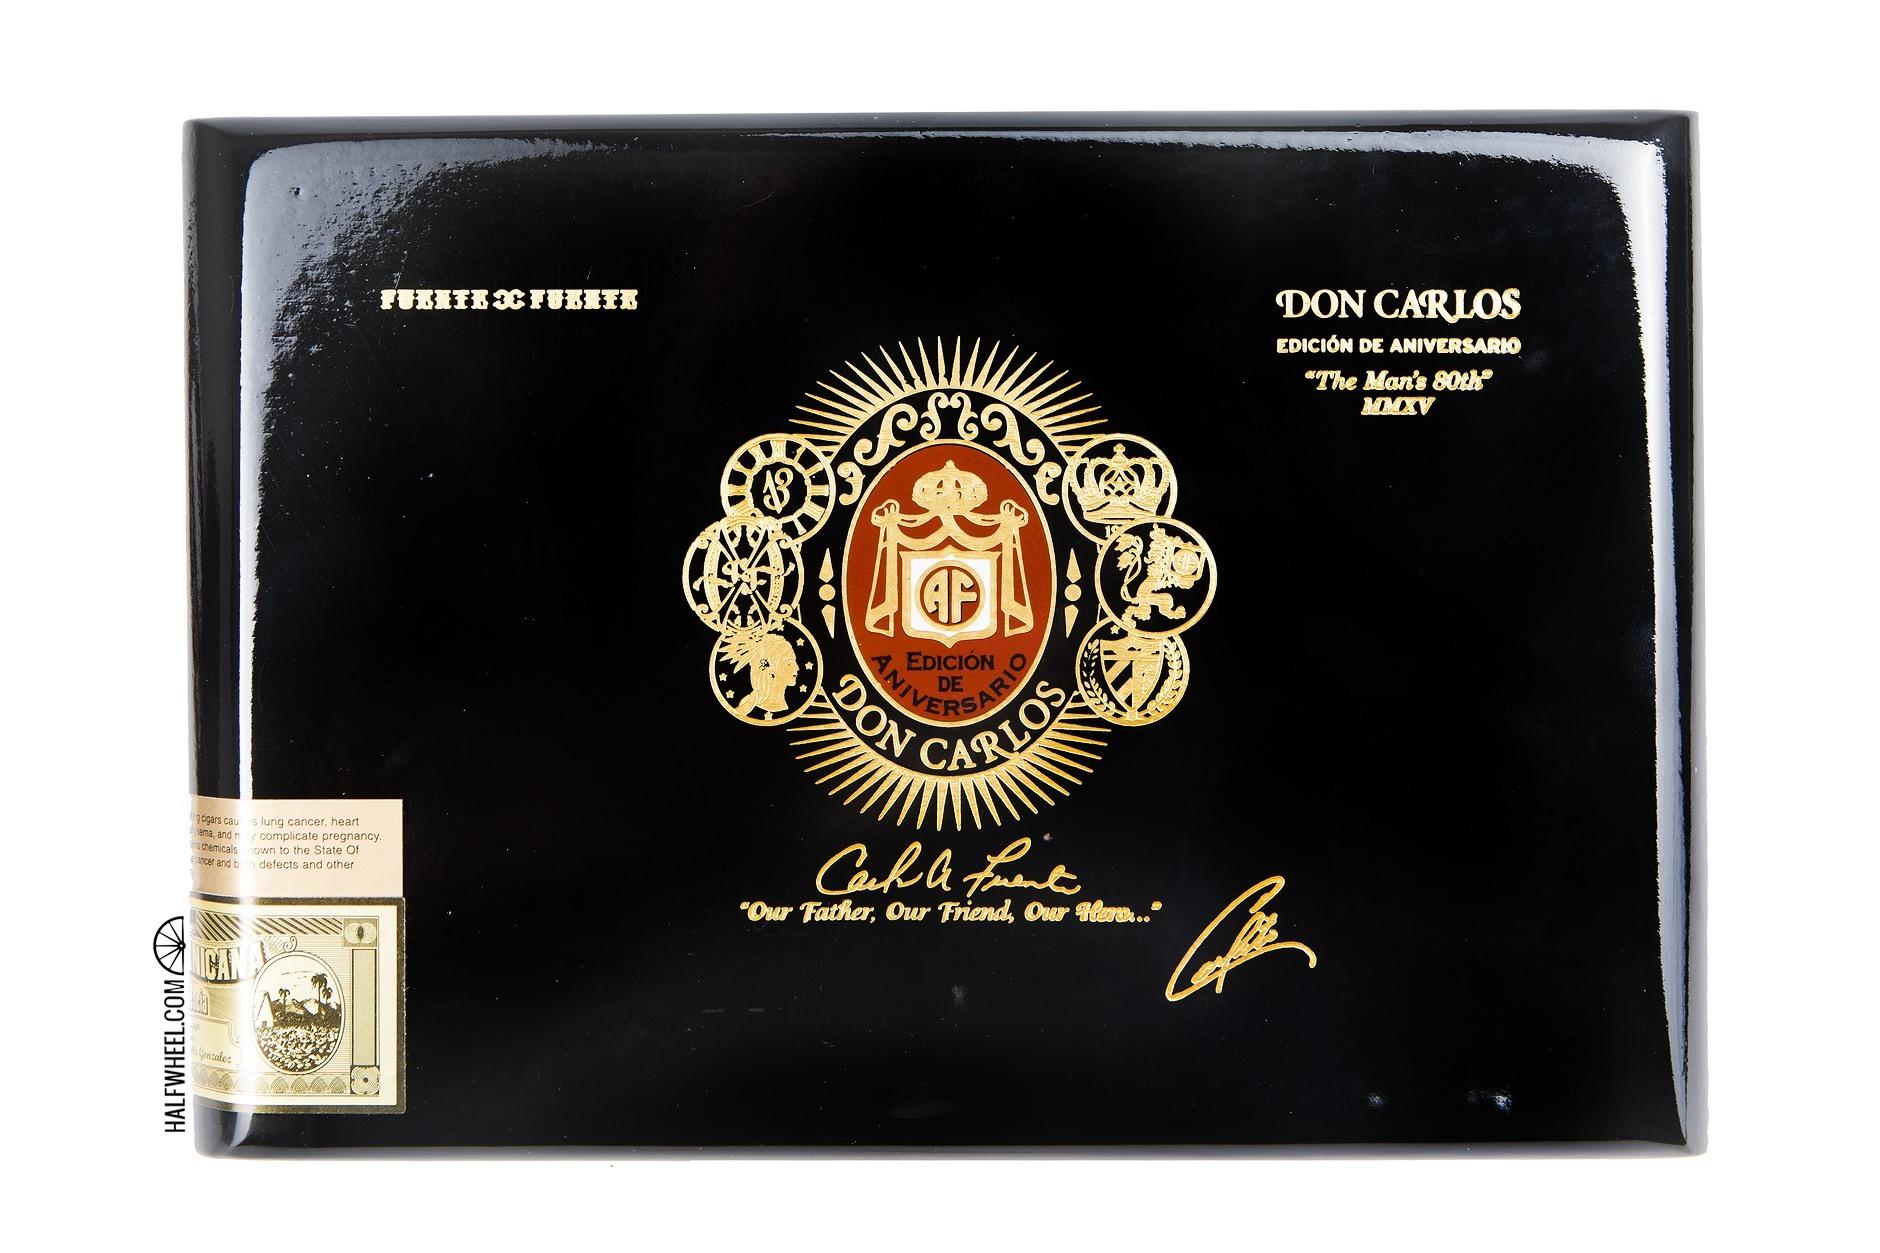 Don Carlos Personal Reserve Robusto Box 2